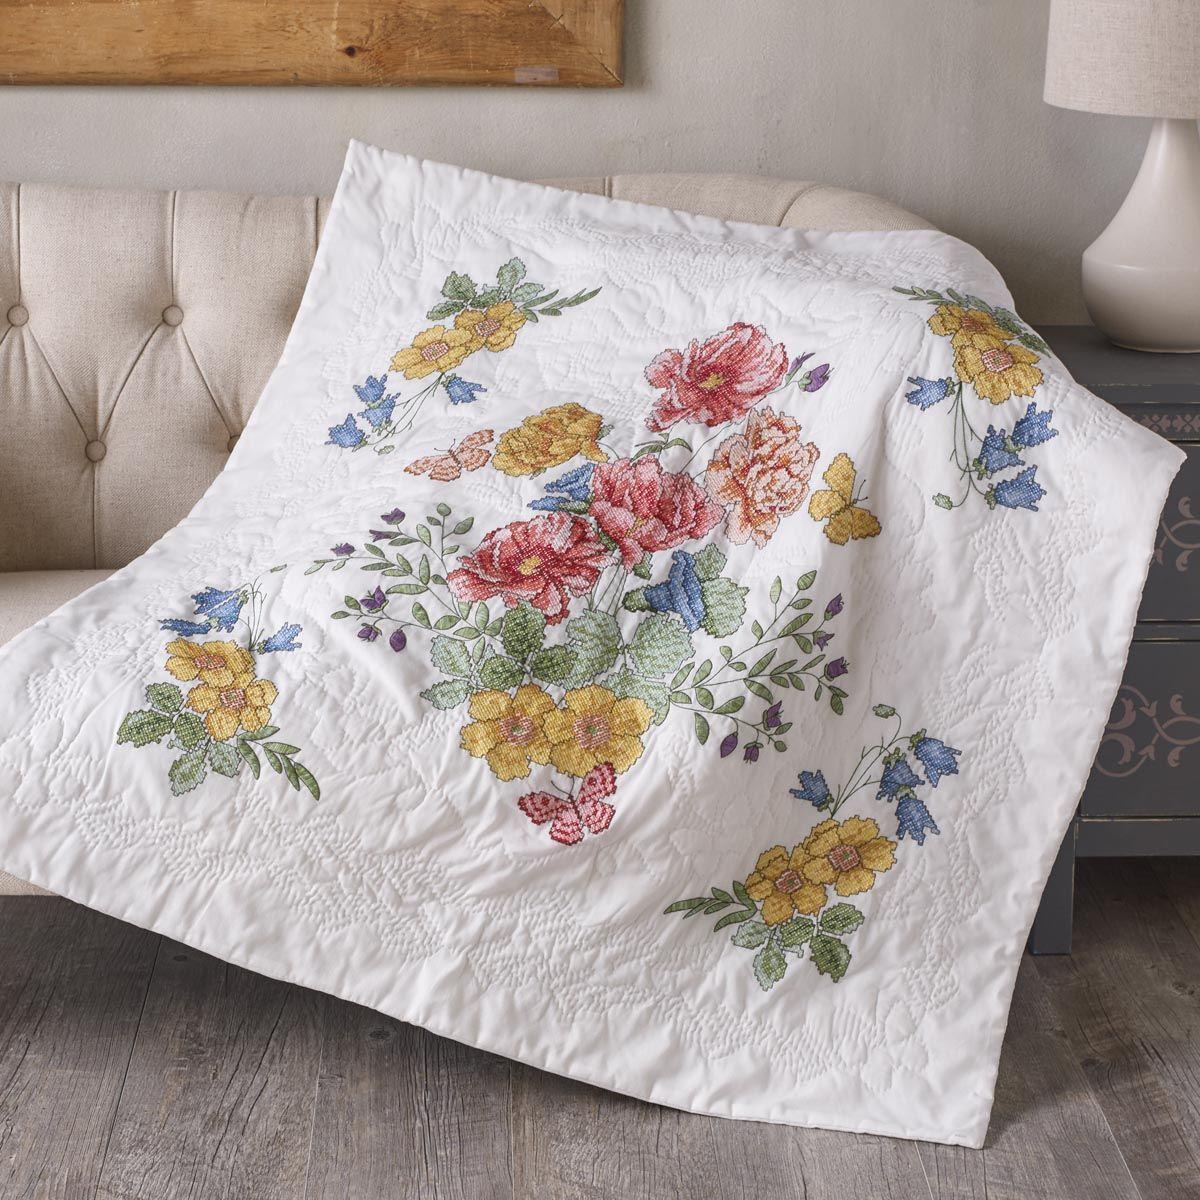 Bucilla ® St&ed Cross Stitch - Lap Quilts - Flowers From the ... : stamped cross stitch lap quilts - Adamdwight.com